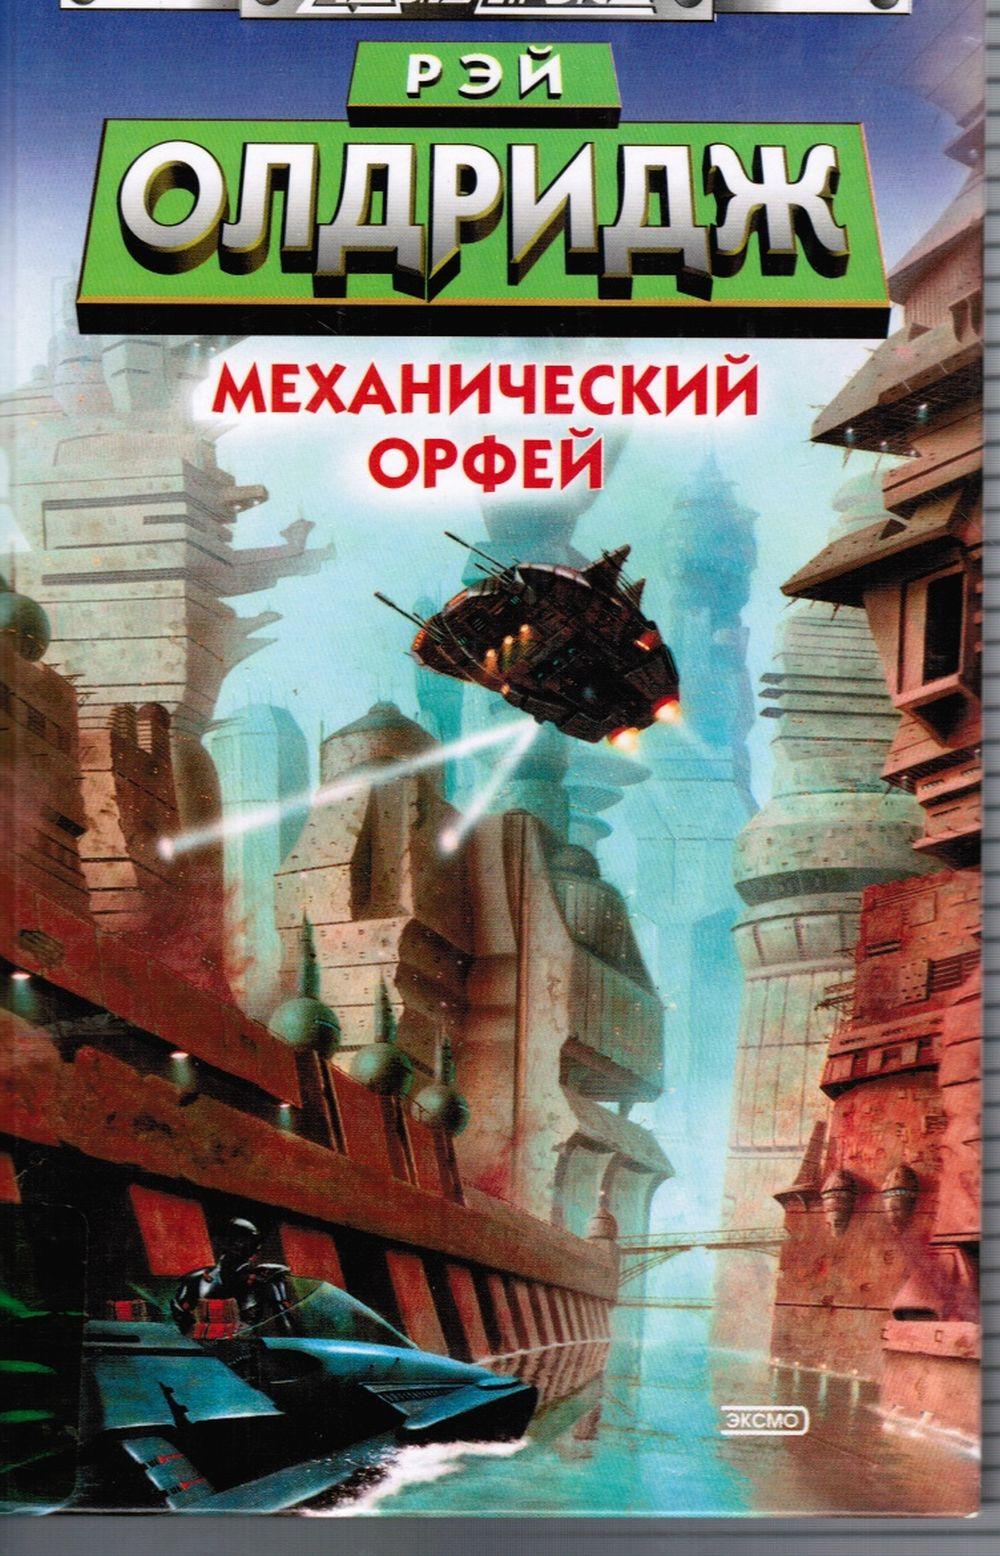 Image for Mekhanicheskii Orfei